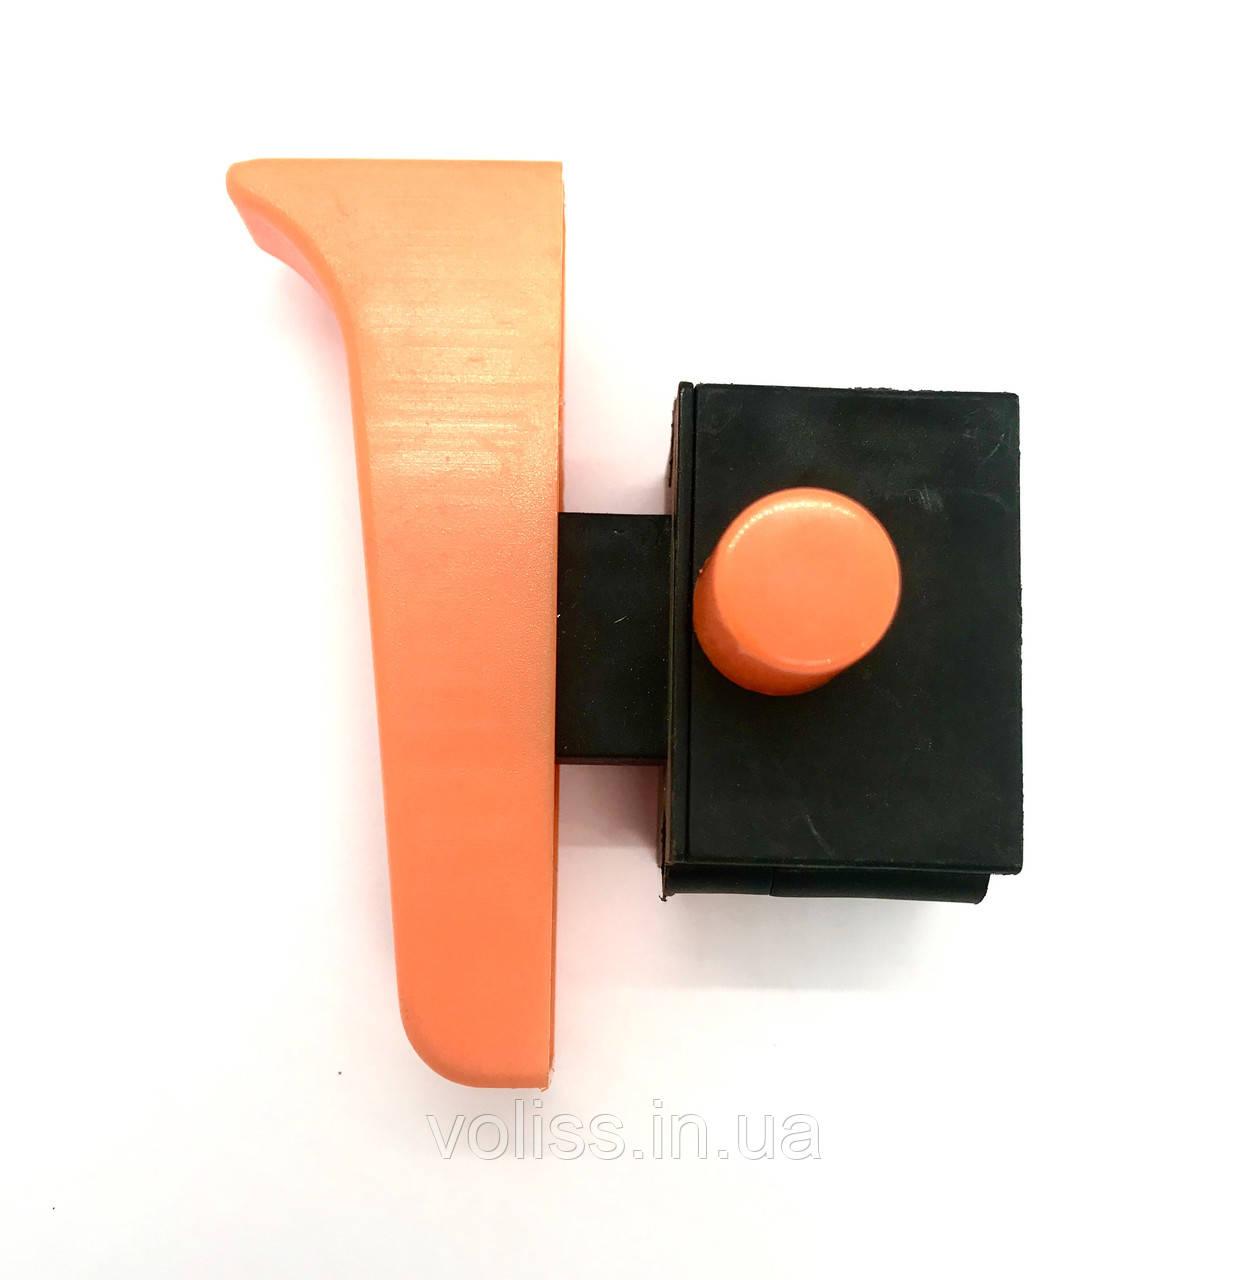 Кнопка для УШМ 230мм кн9